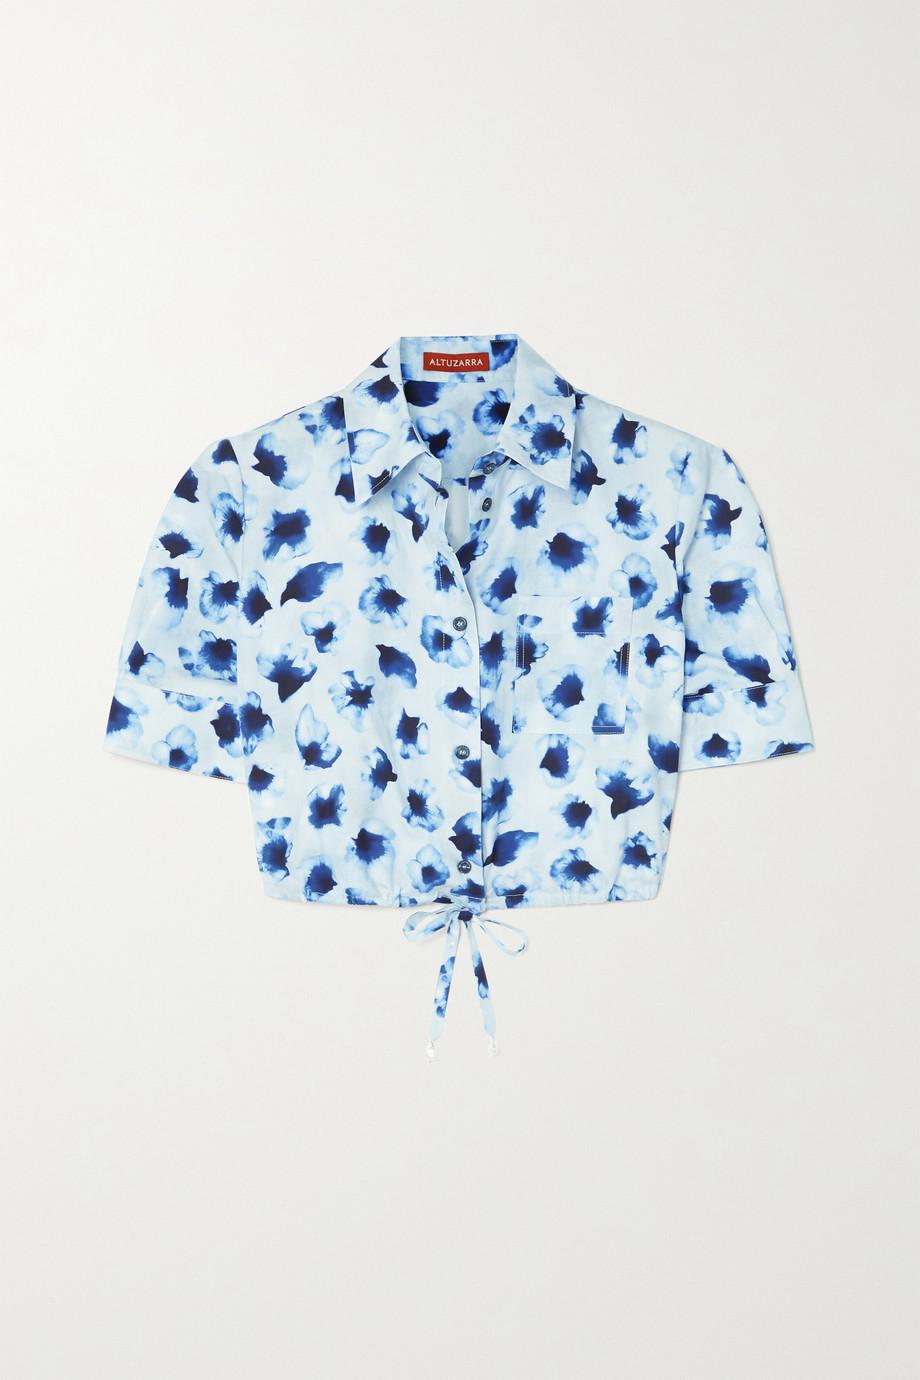 Altuzarra Ben verkürztes Hemd aus Baumwollpopeline mit Blumenprint